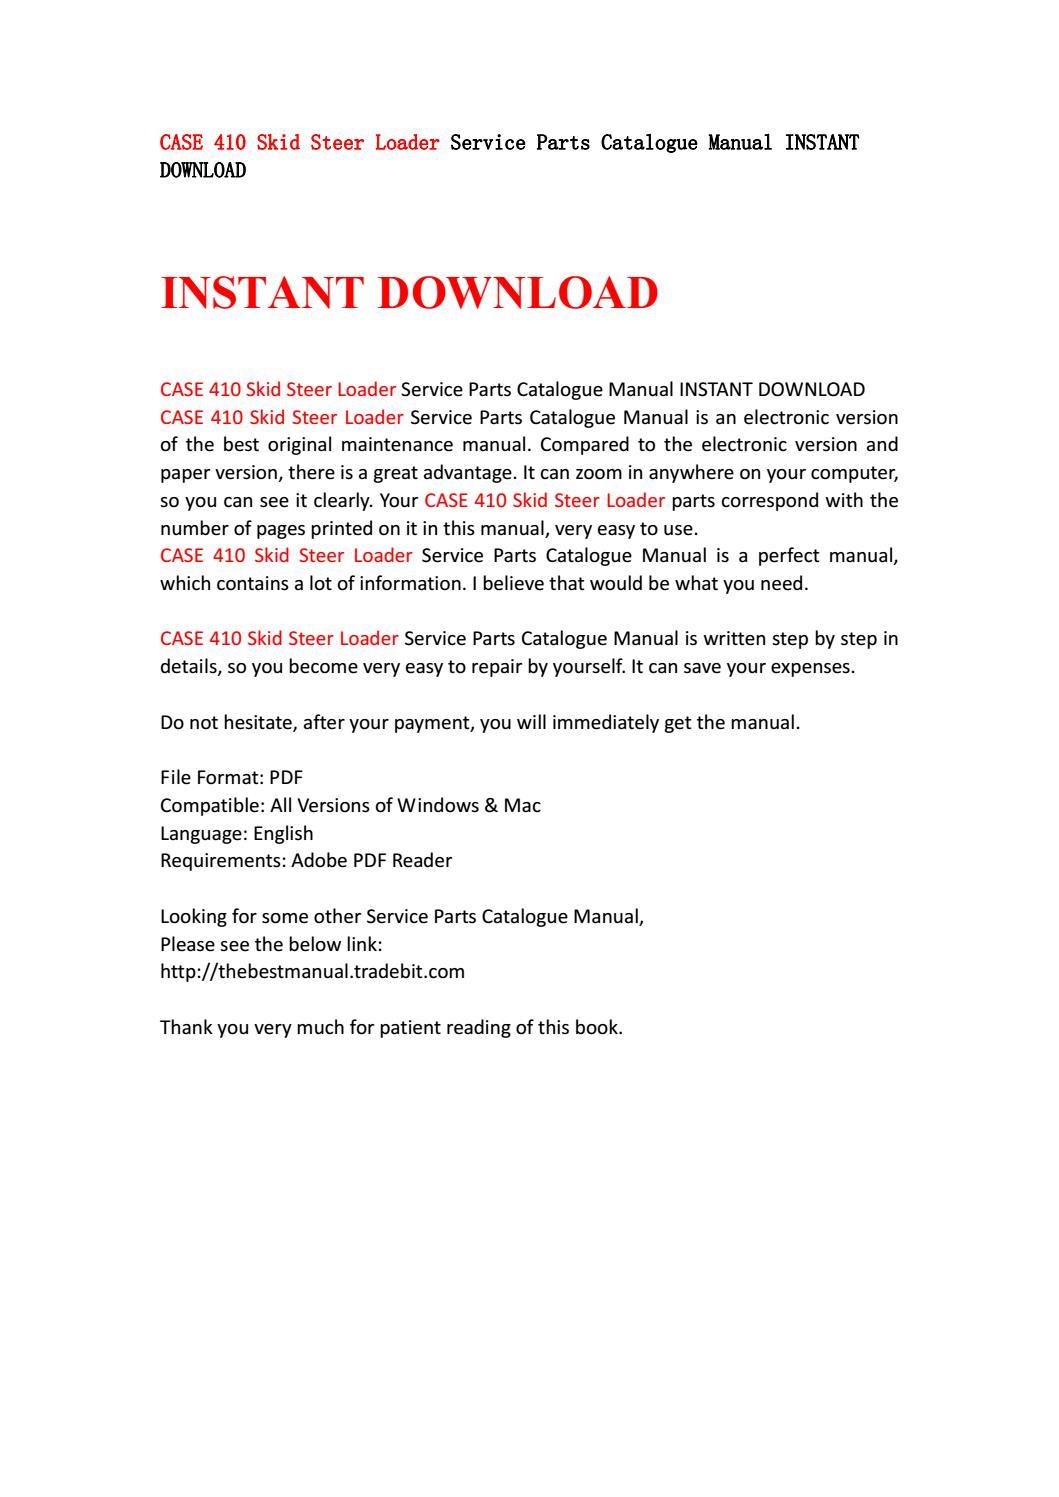 Case 410 Skid Steer Loader Service Parts Catalogue Manual